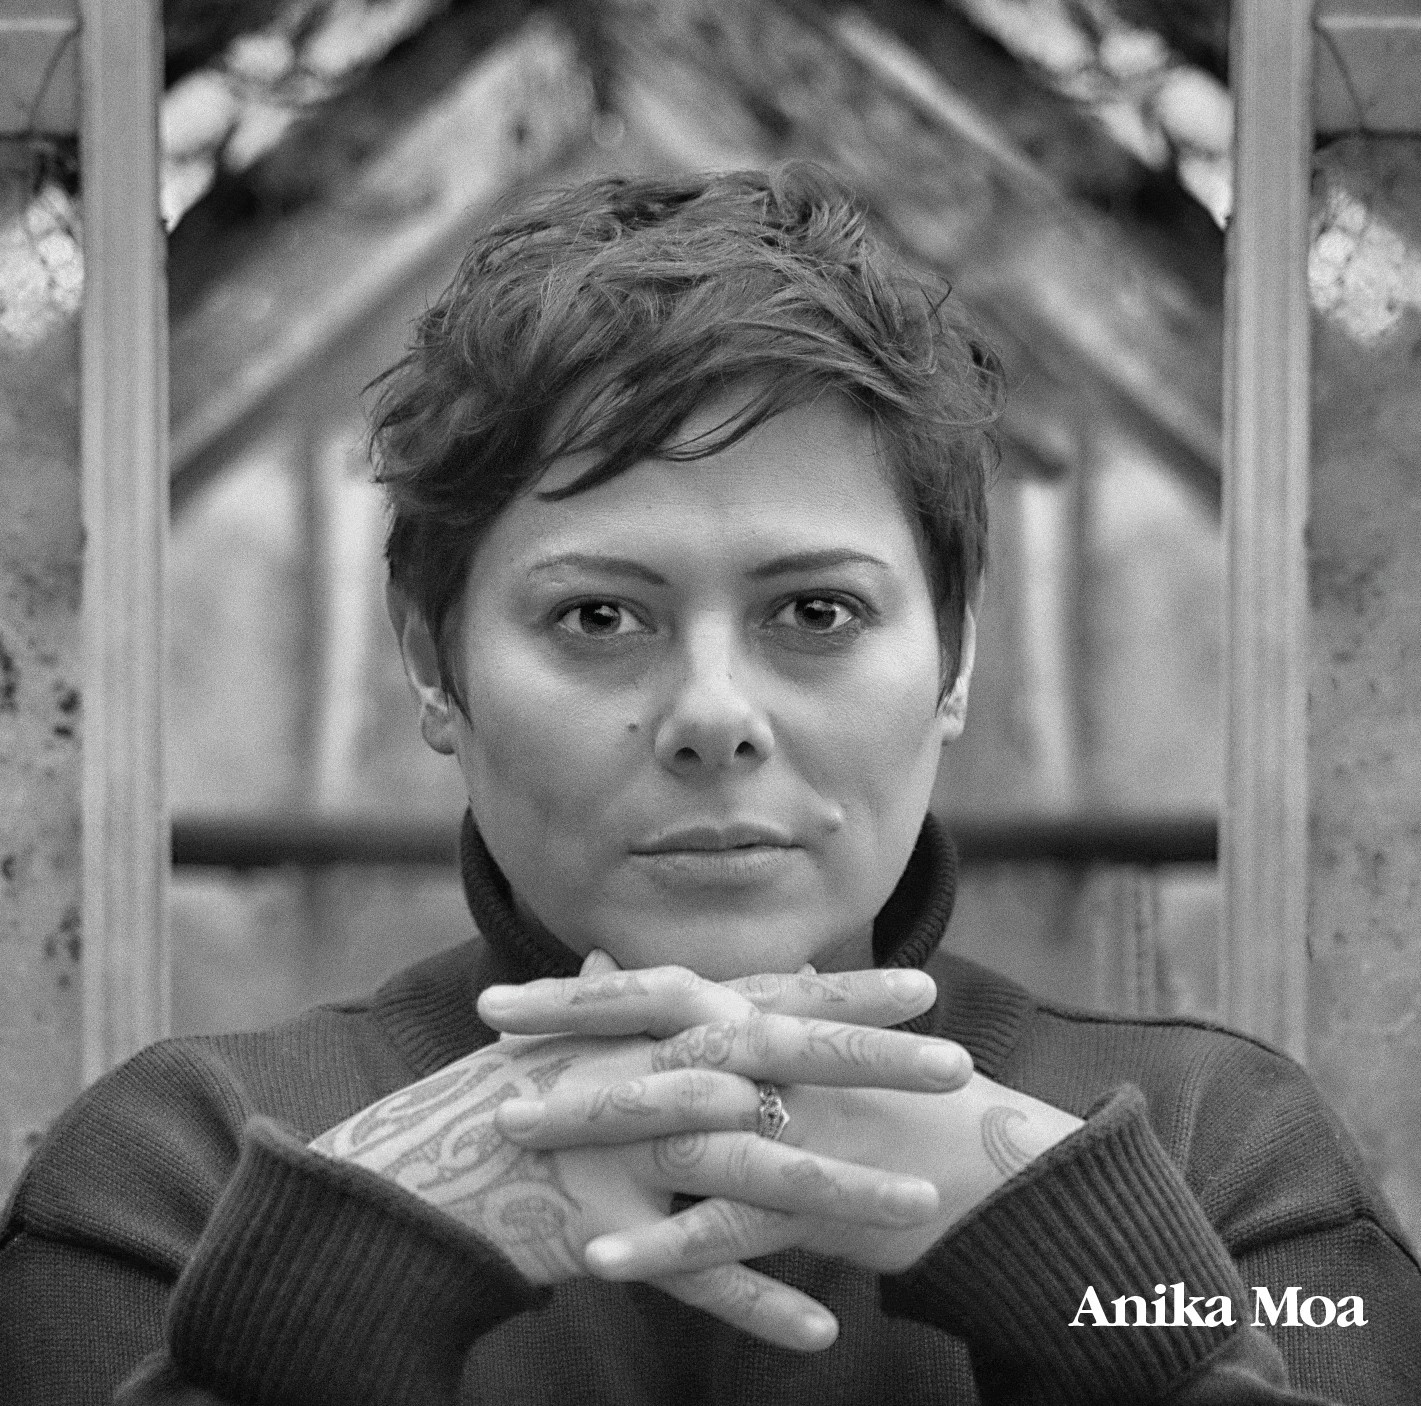 Anika Moa by Anika Moa image